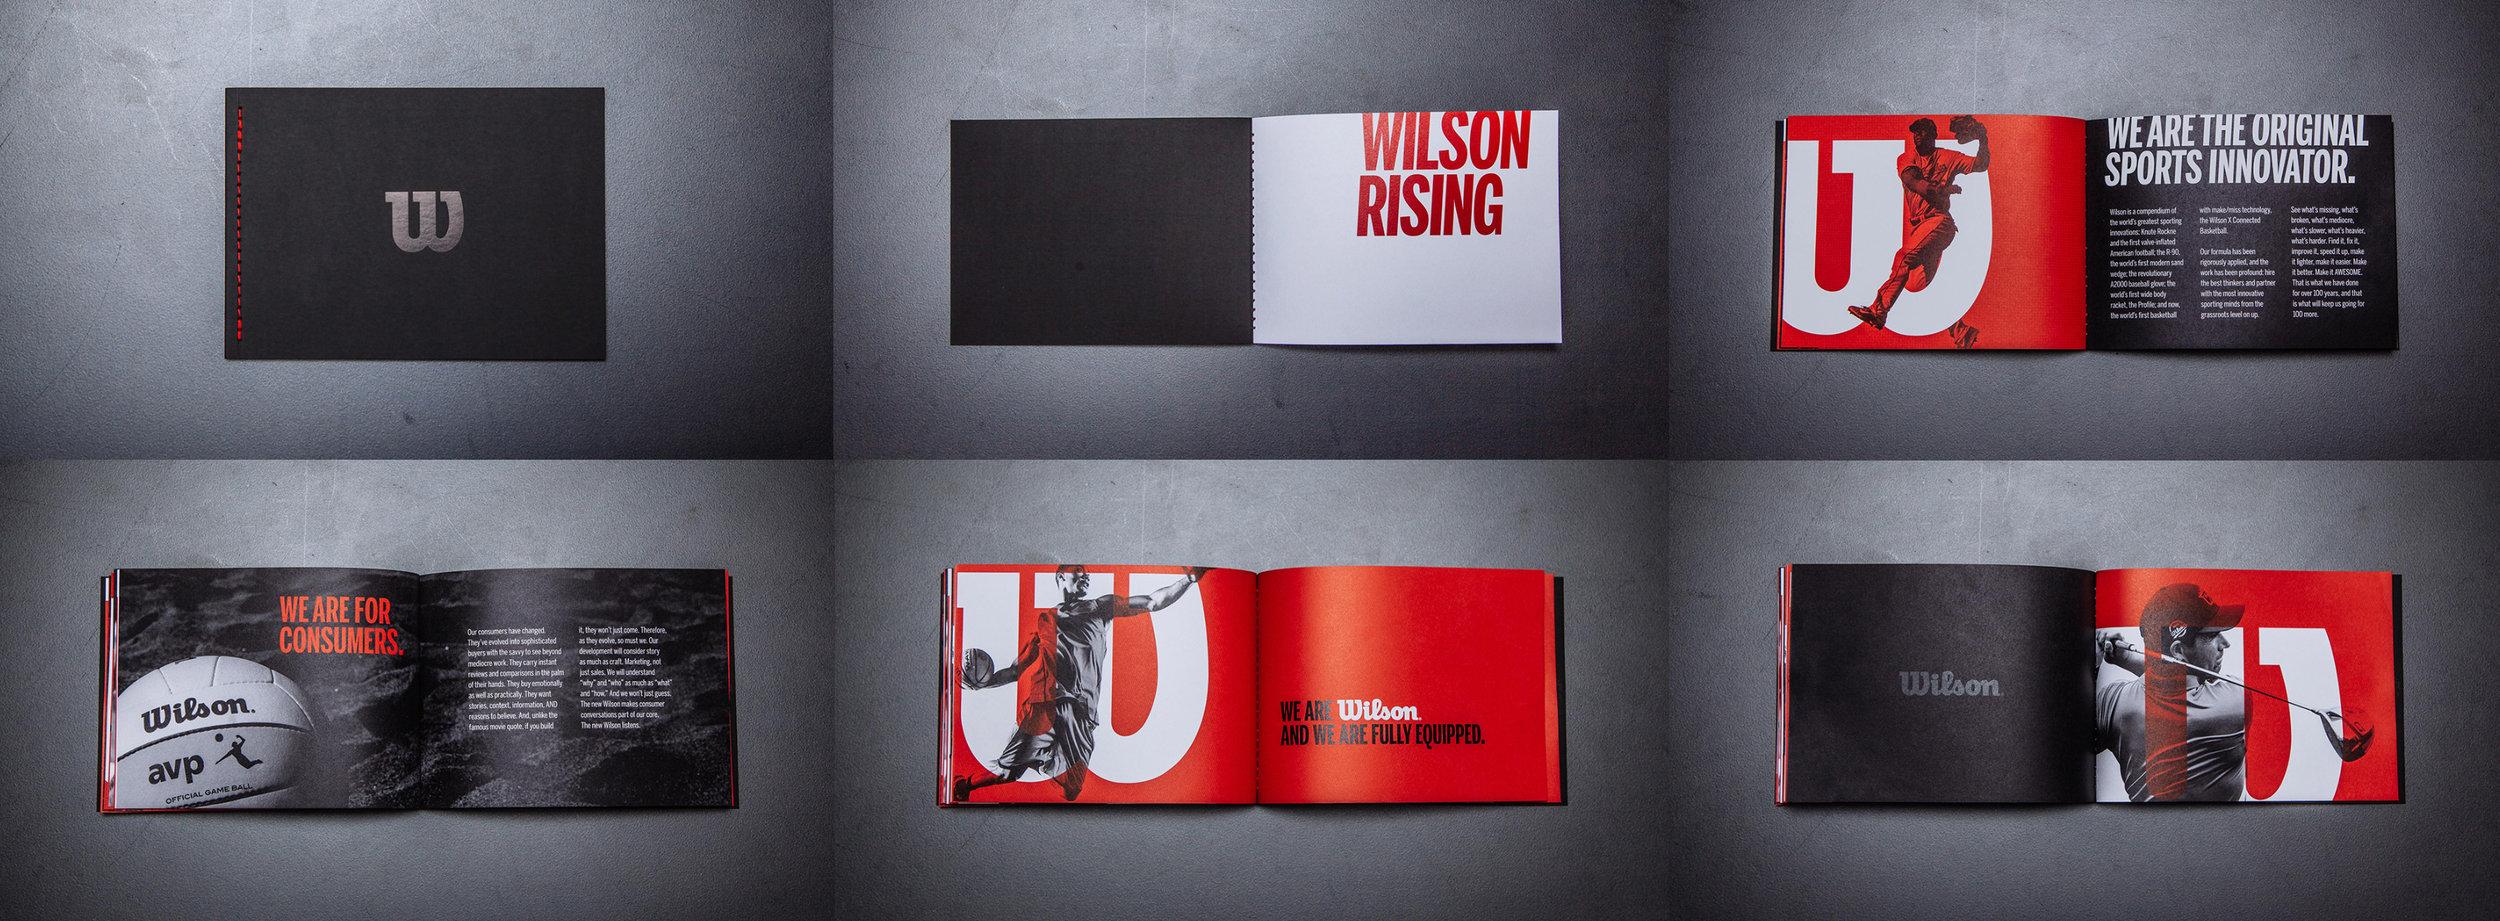 WILSON BRAND BOOK LAYOUT.jpg